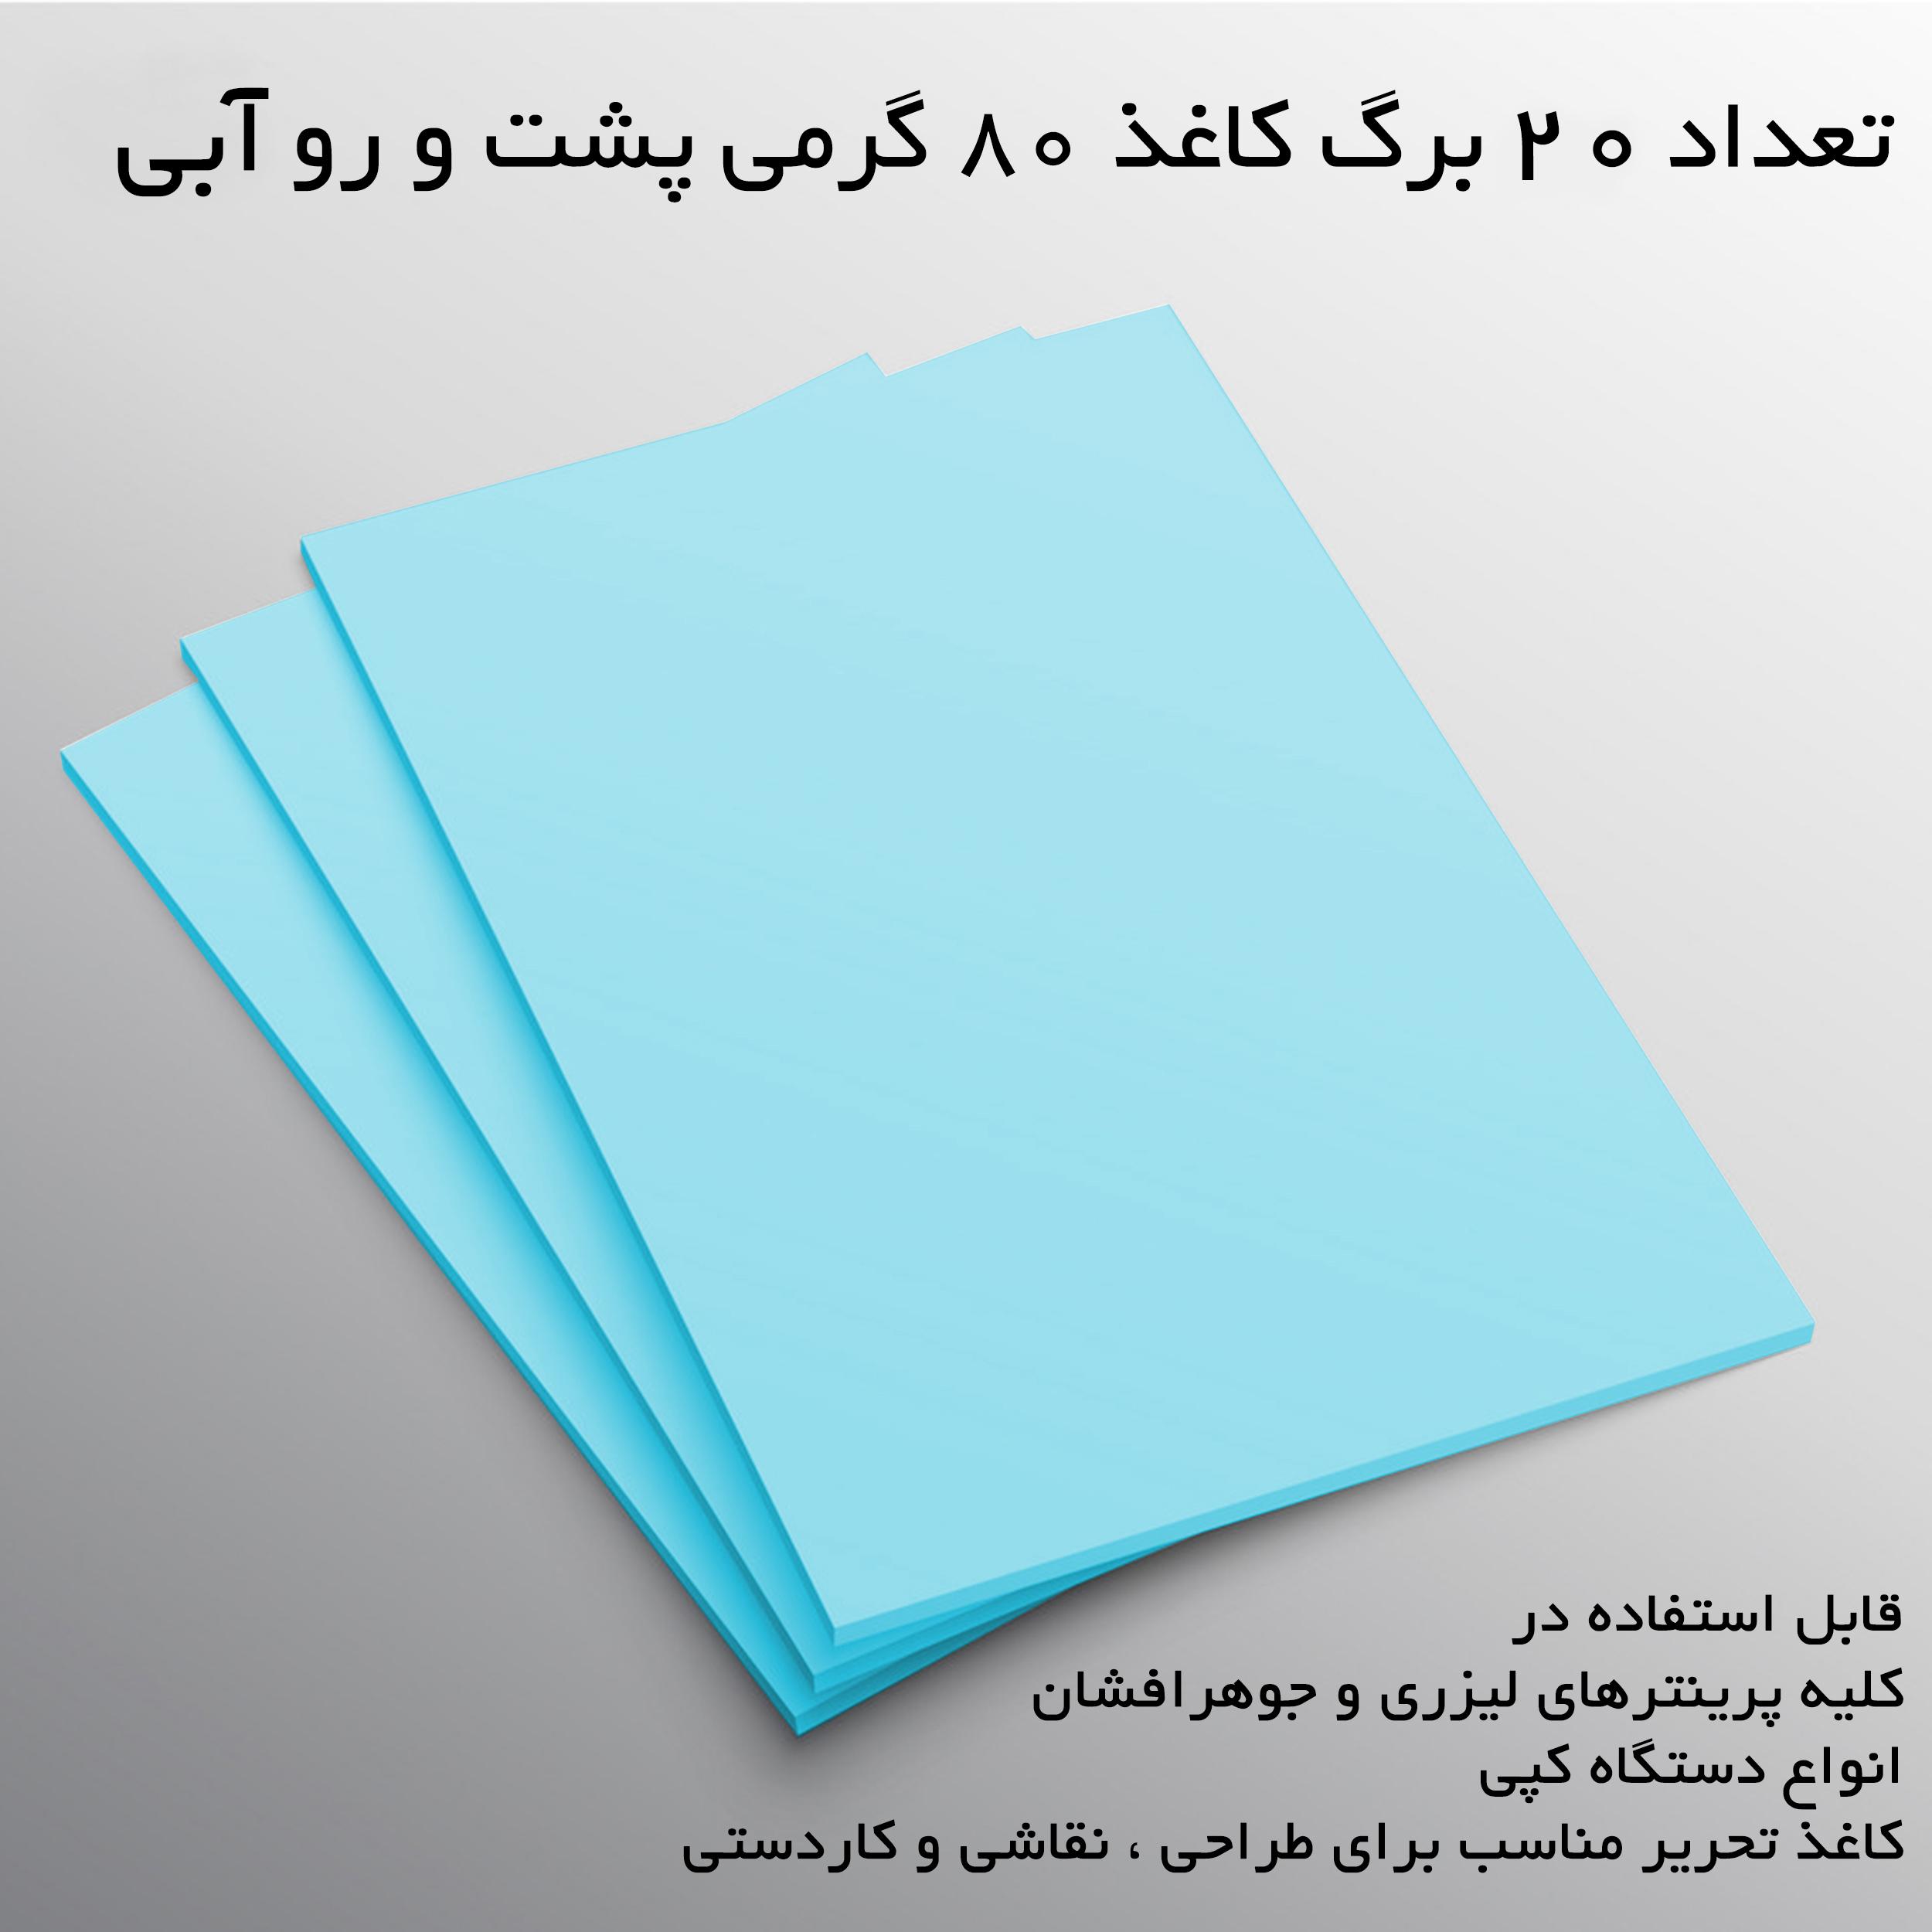 کاغذ رنگی A4  FG کد BI-20 بسته 20 عددی